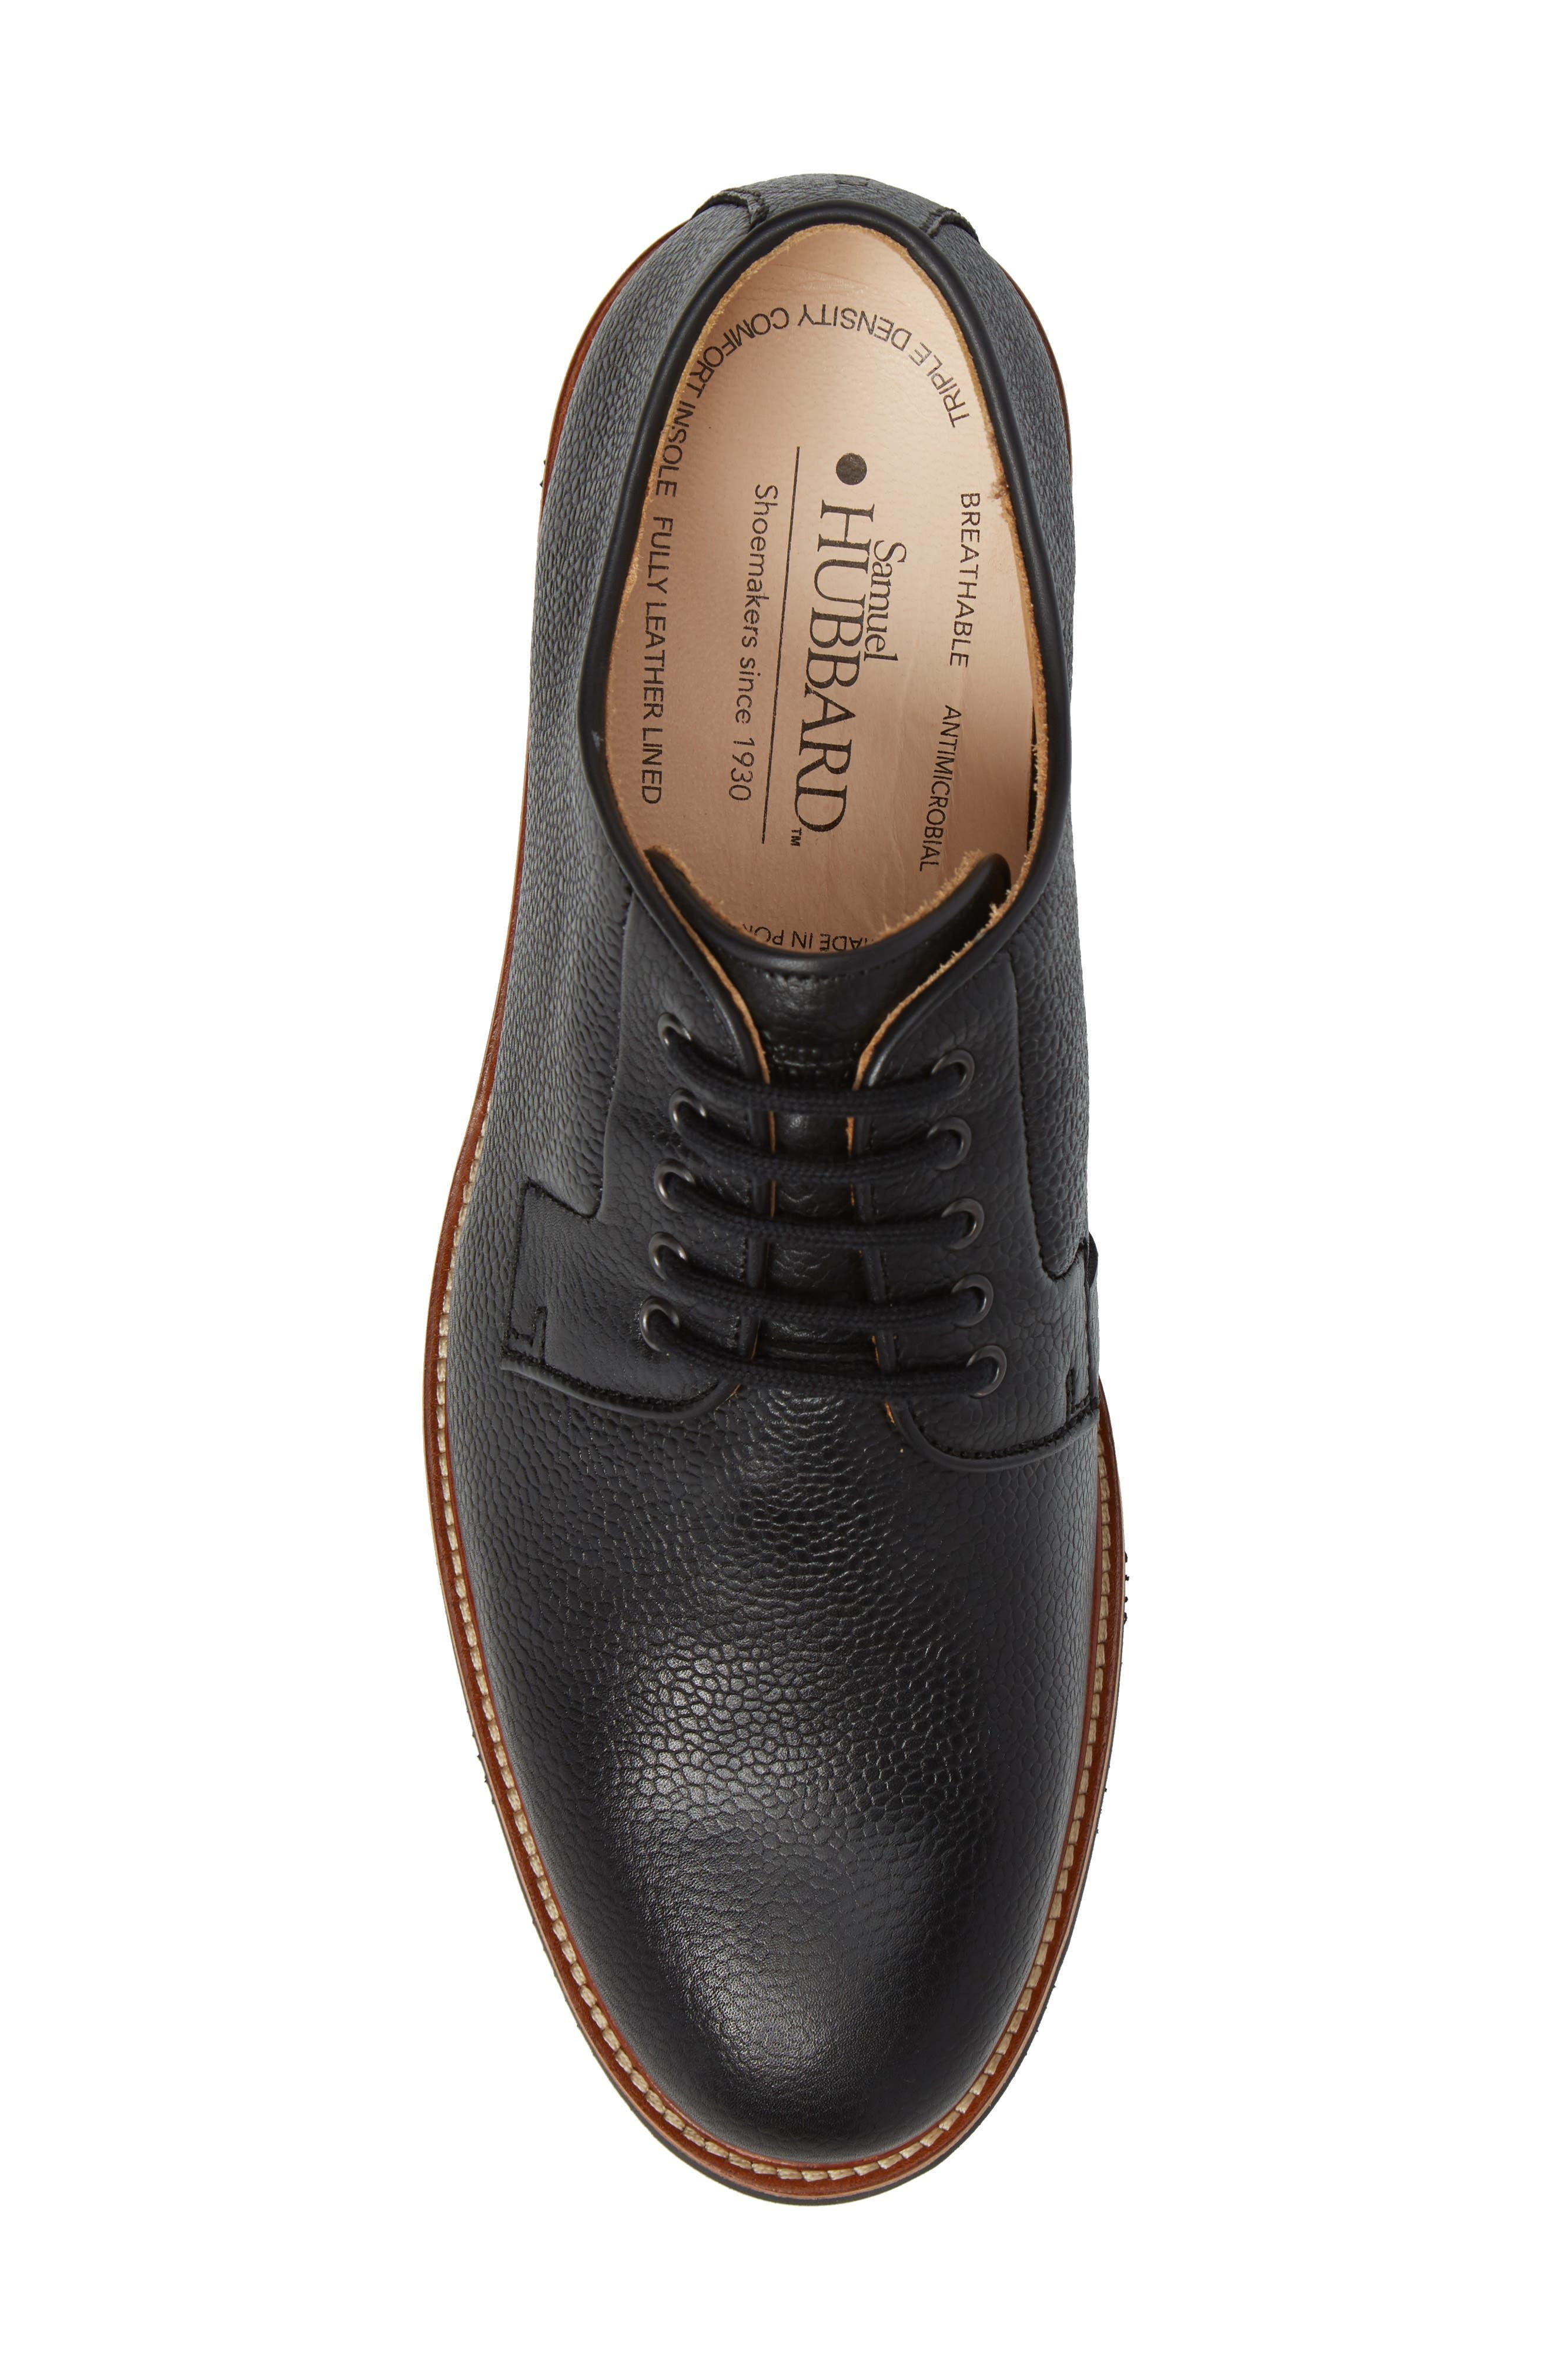 SAMUEL HUBBARD, Highlander Plain Toe Derby, Alternate thumbnail 5, color, BLACK PEBBLE GRAIN